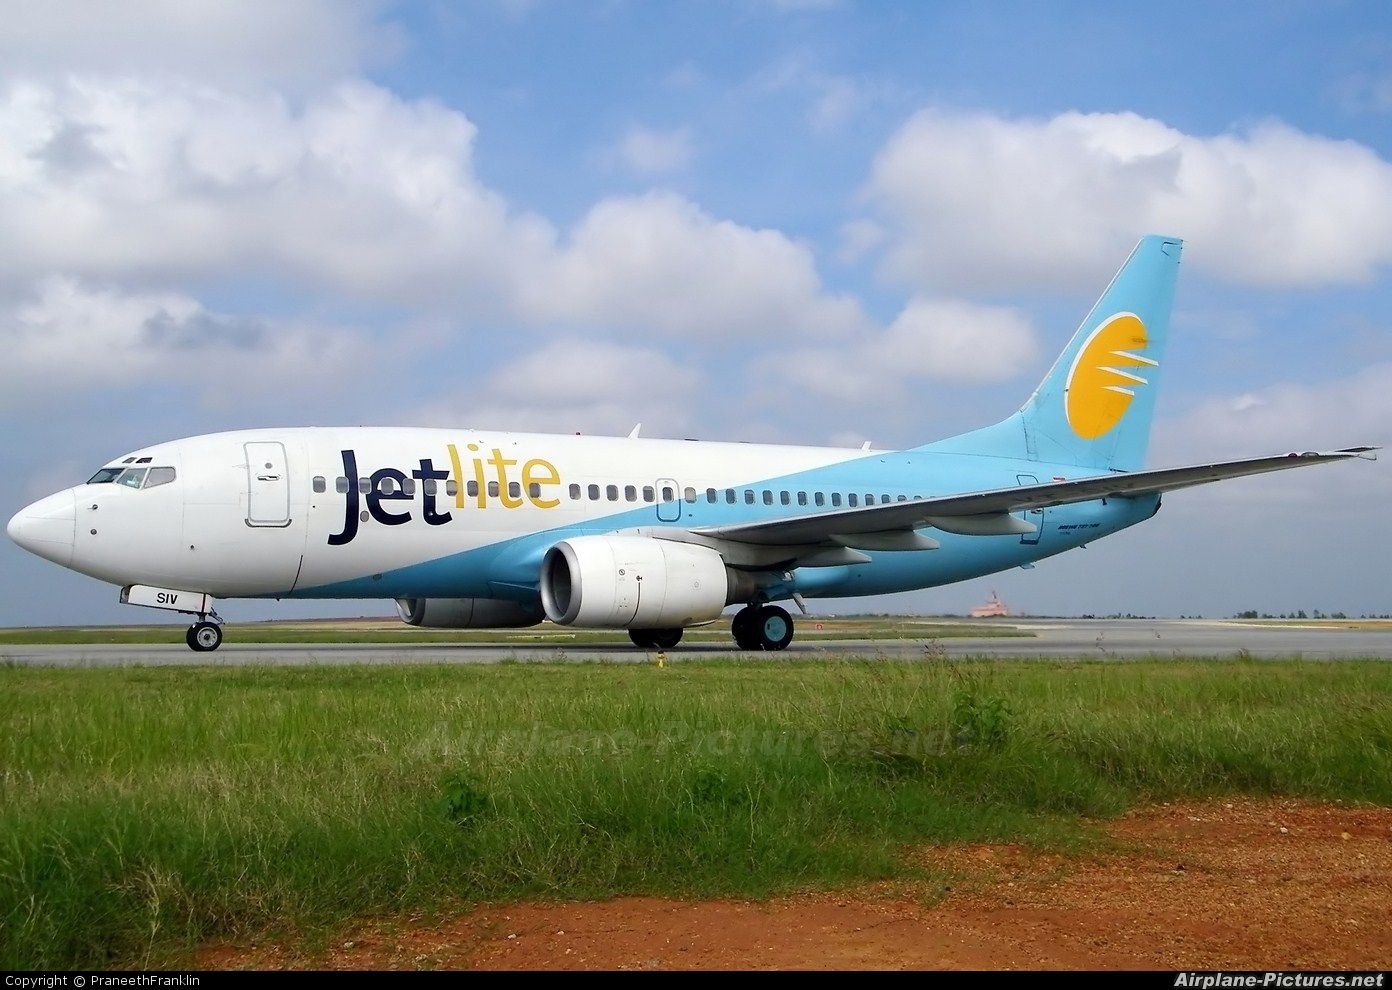 Jet Lite India VT-SIV aircraft at Bangalore - Bengaluru Intl